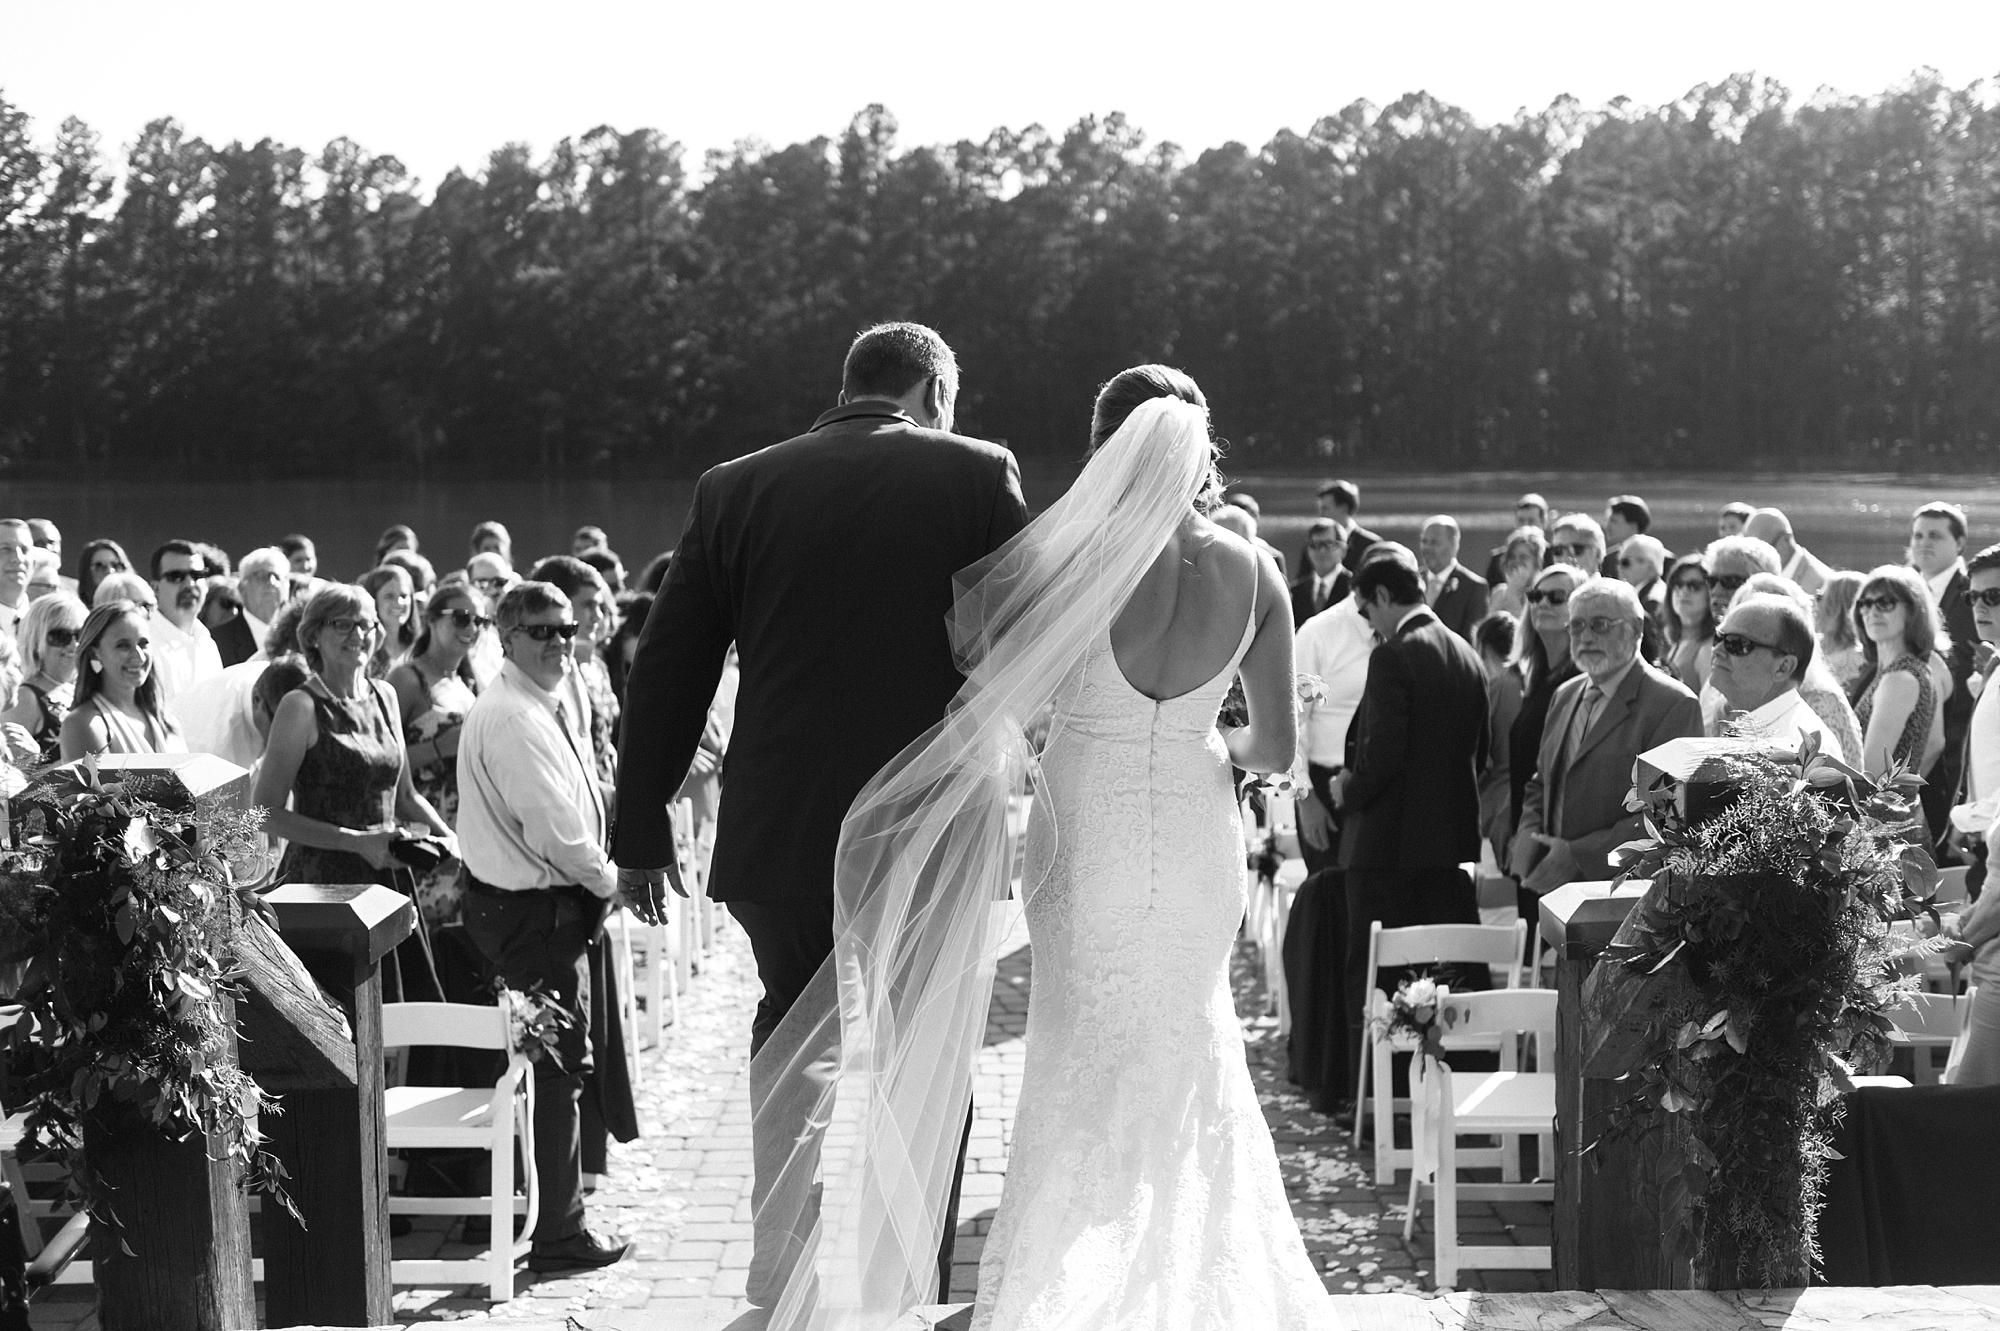 Angus-Barn-Pavilion-Raleigh-Wedding-Film-Photographer_0153.jpg